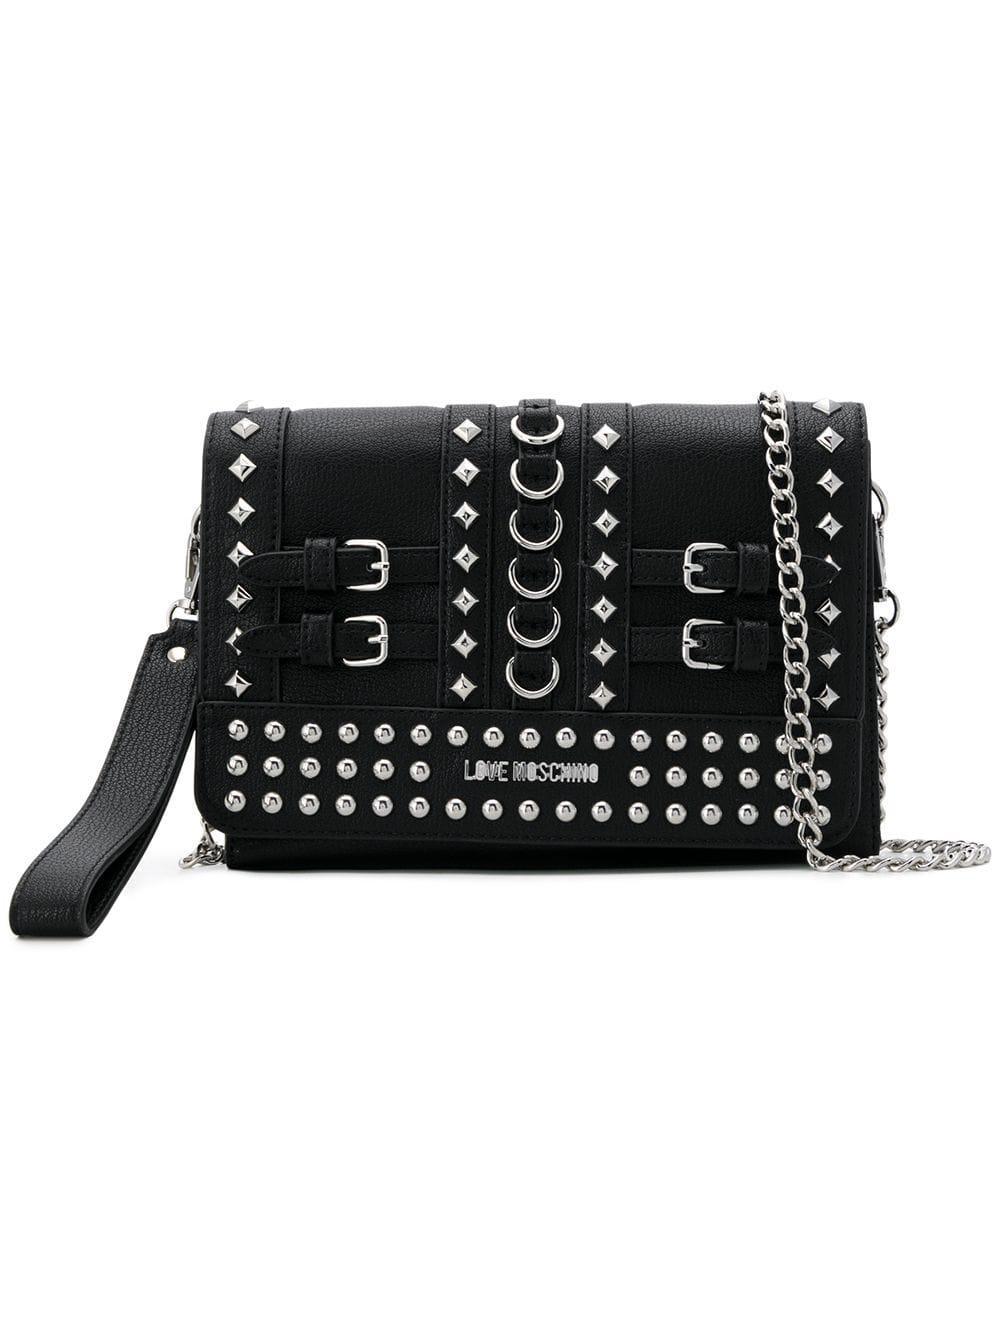 44e1d375dc4b Love Moschino Studded Clutch Bag In Black